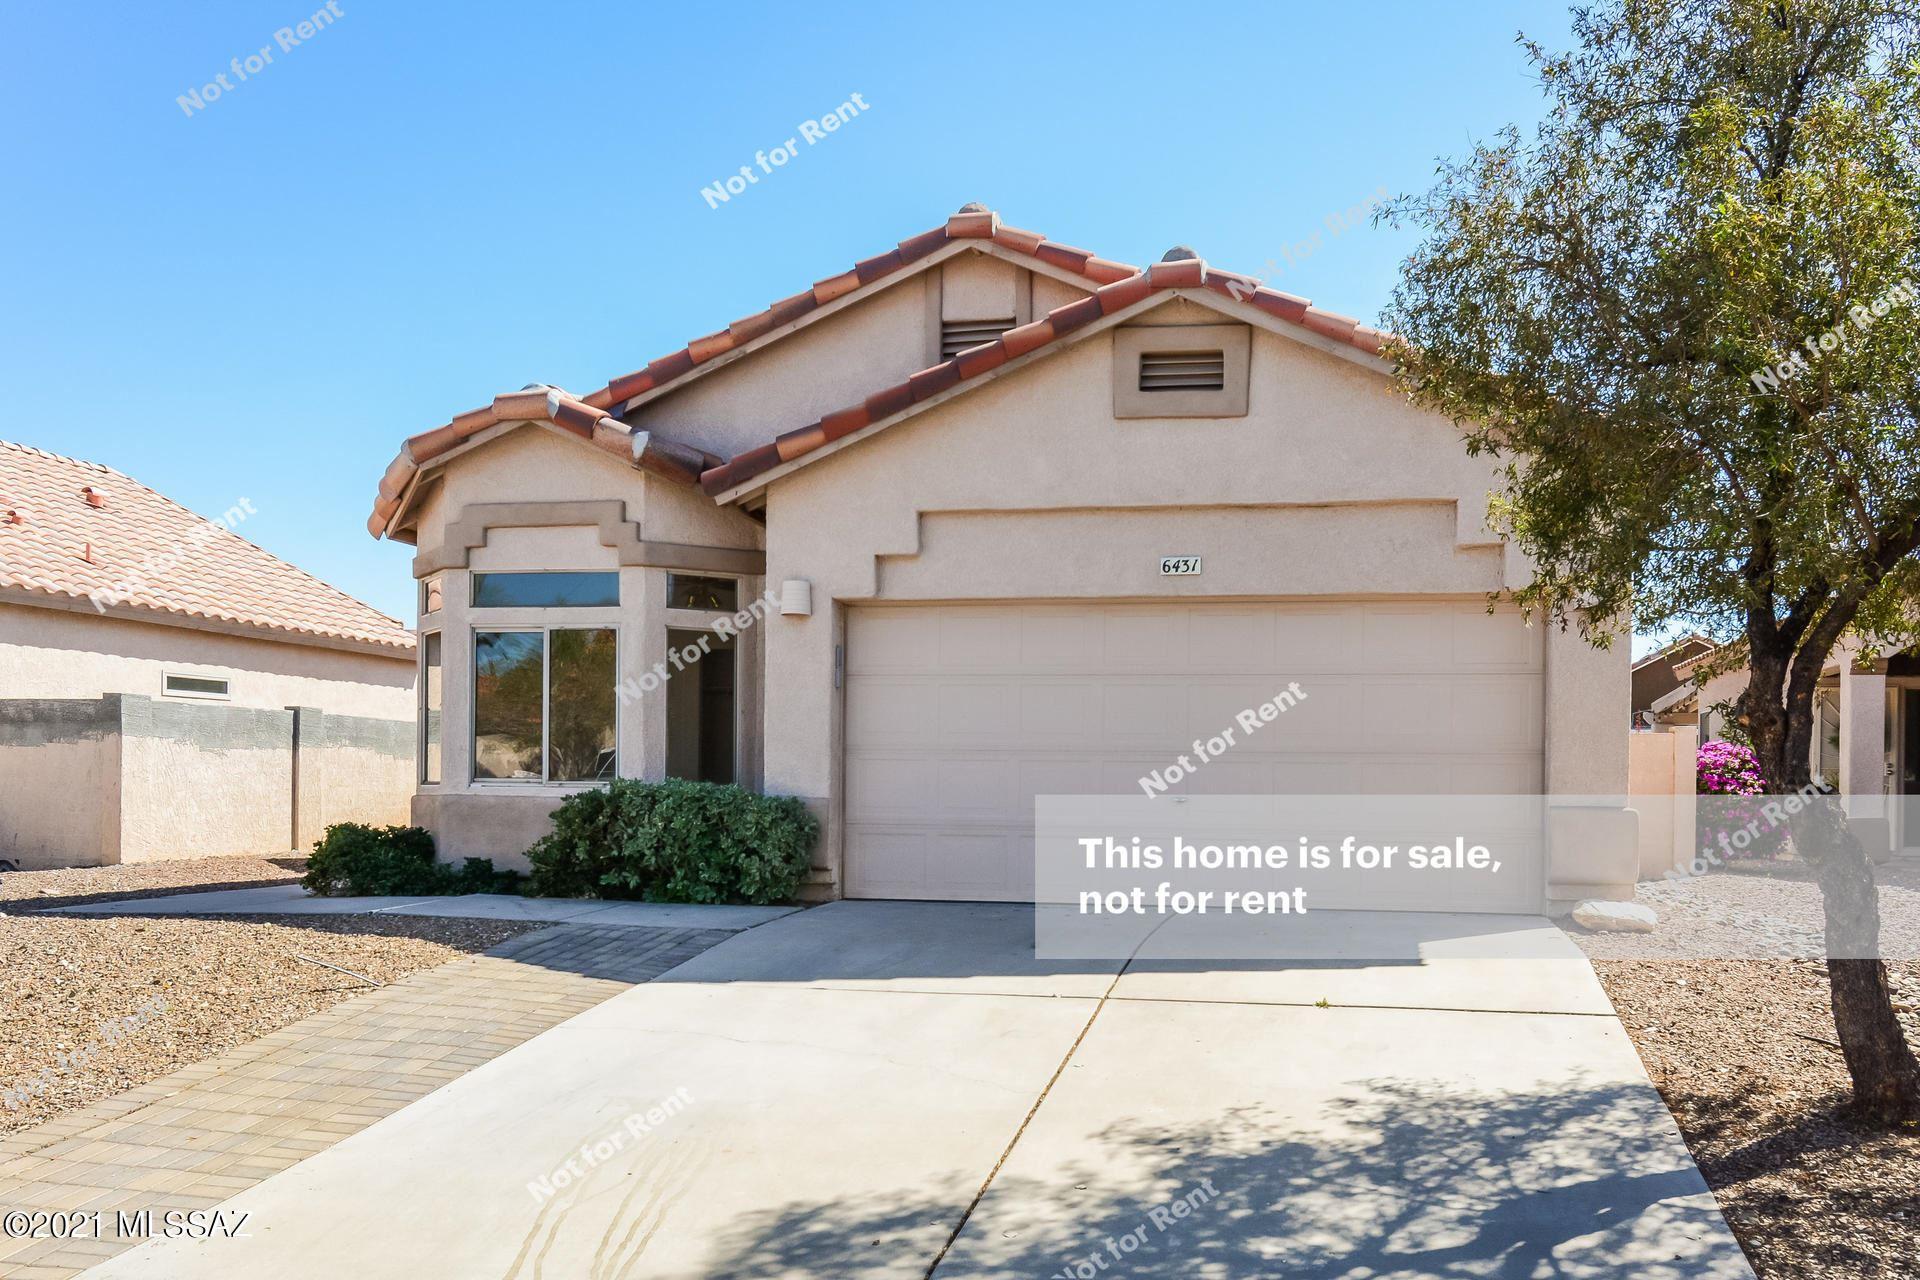 6431 W Rosamond Way, Tucson, AZ 85743 - MLS#: 22109483